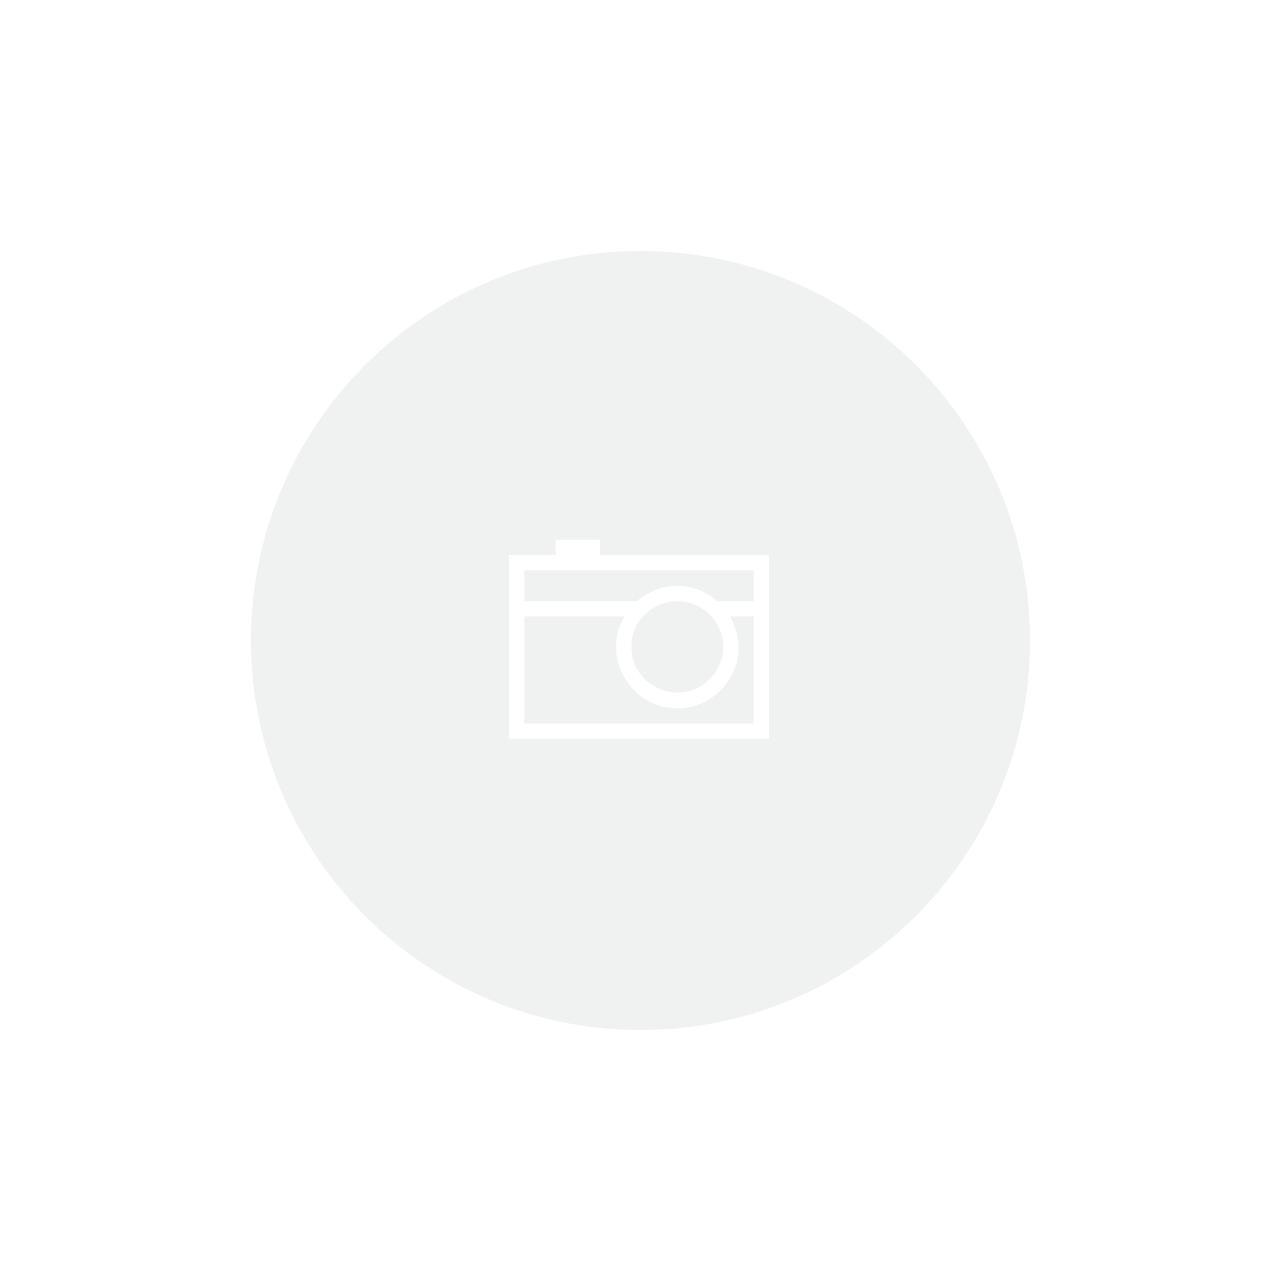 Máquina de Tosa Profissional Oster A6 Slim Purpura + Jogo Adaptadores de Metal Oster - Combo